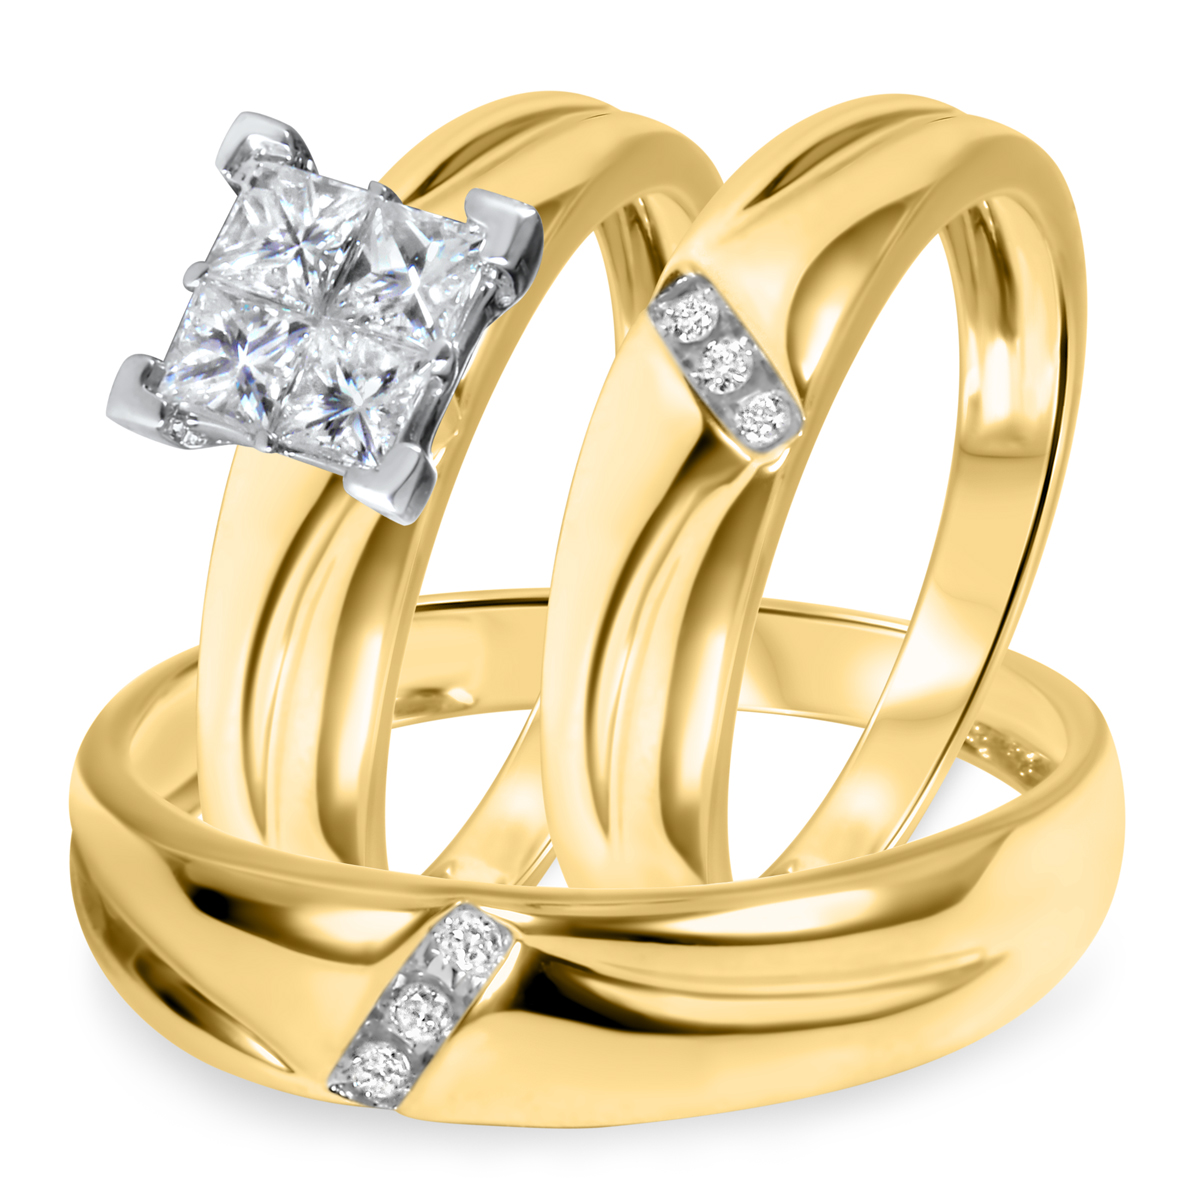 5/8 CT. T.W. Diamond Ladies Engagement Ring, Wedding Band, Men's Wedding Band